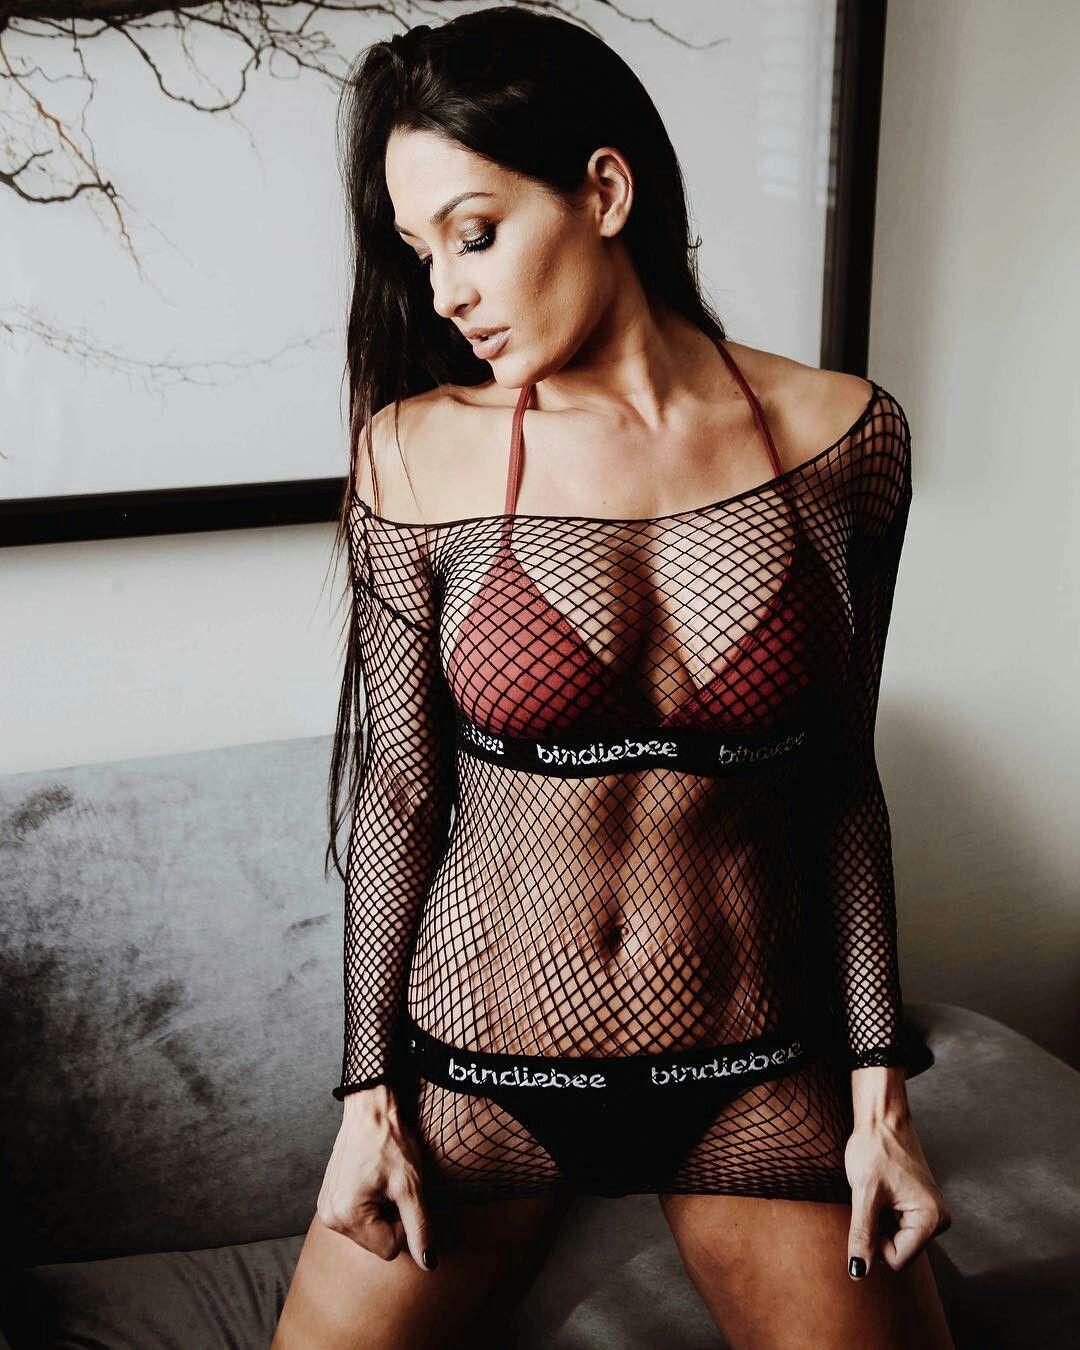 Nikki Bella sexy look pic